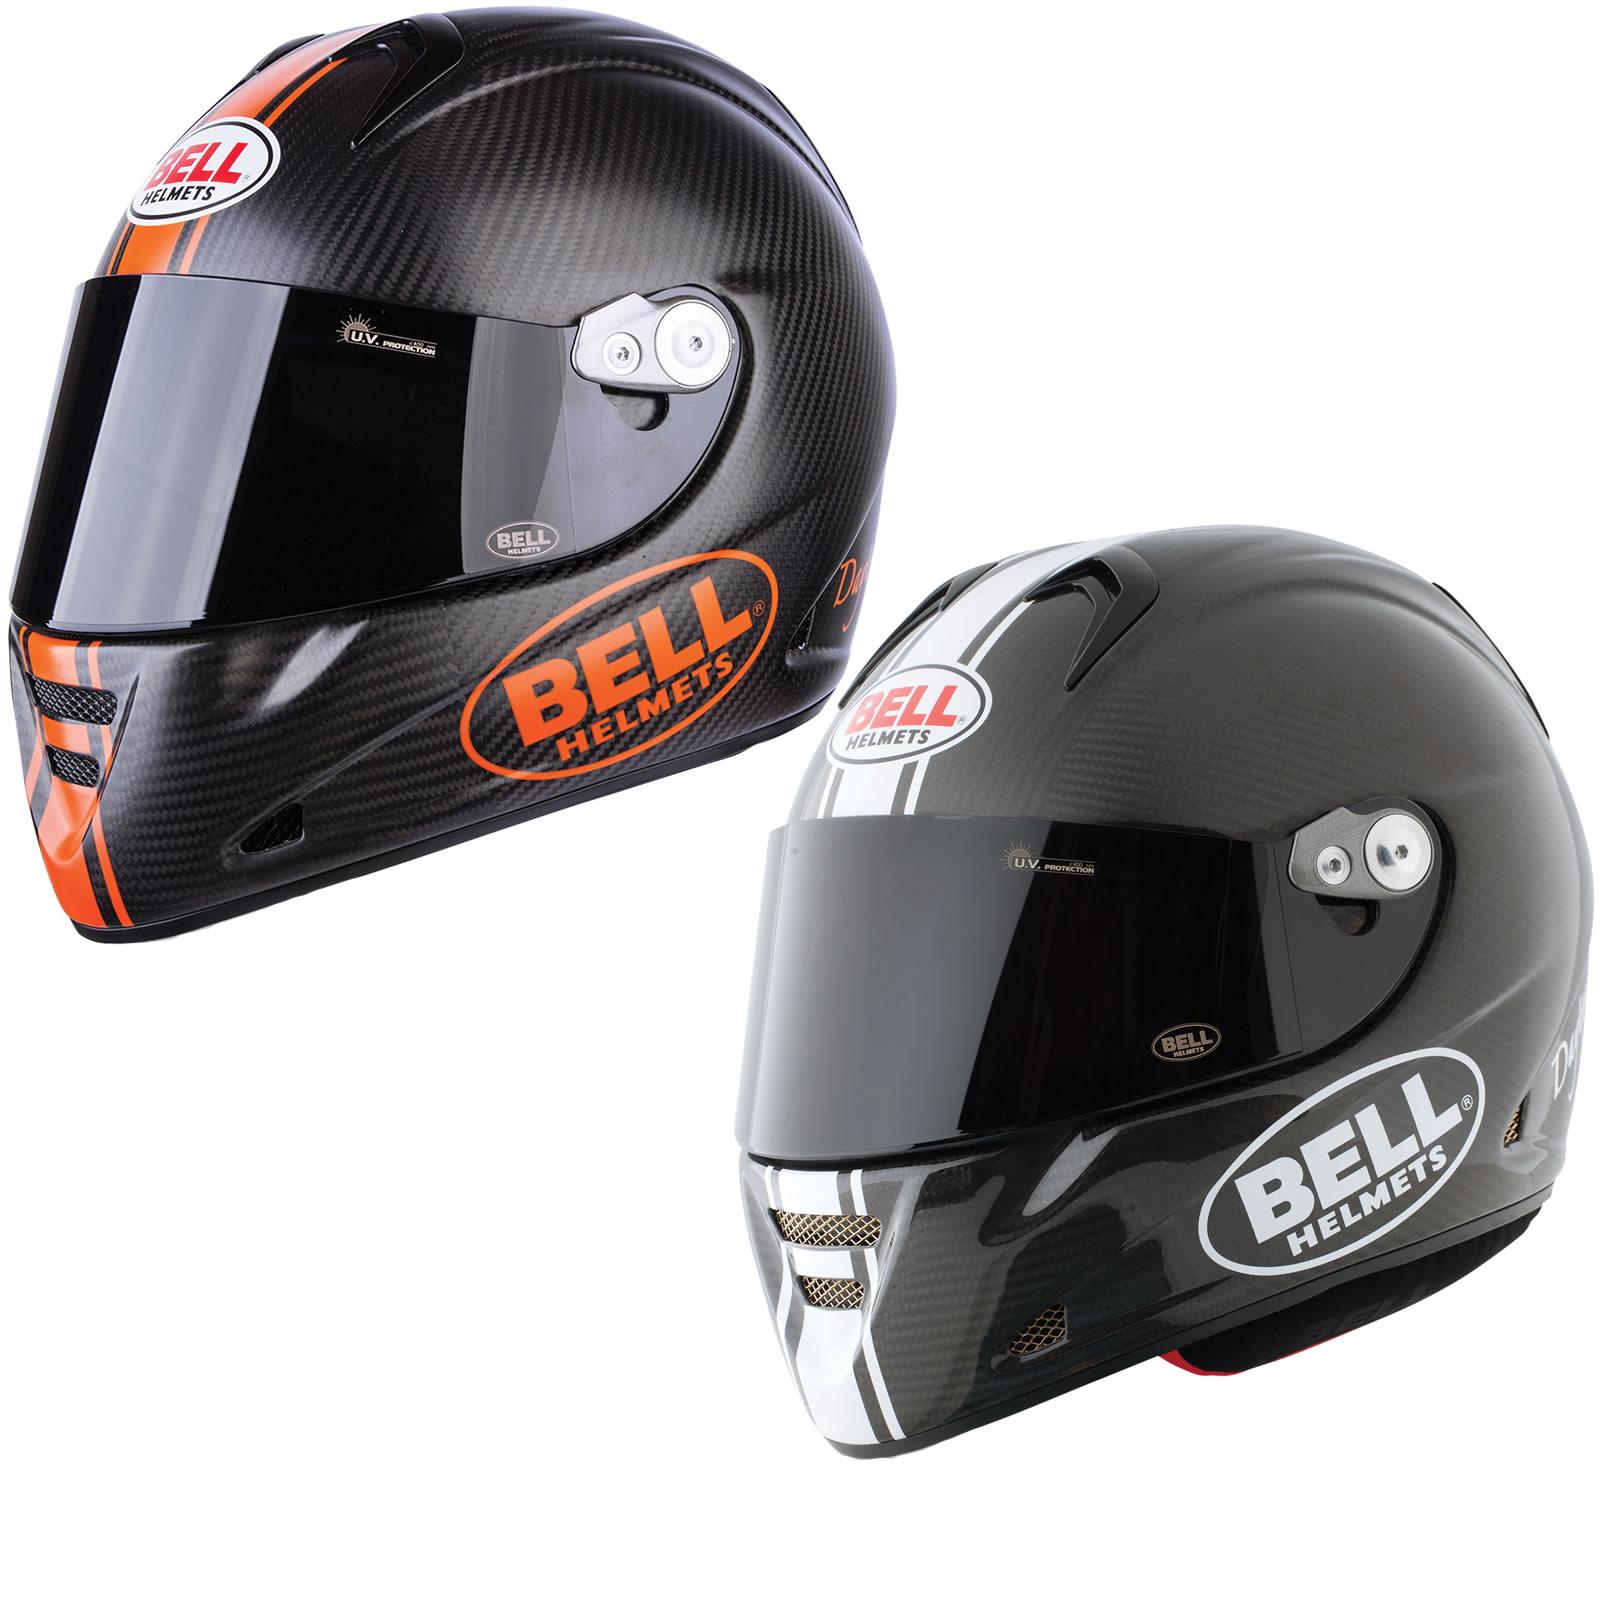 bell m5x daytona carbon motorcycle helmet full face. Black Bedroom Furniture Sets. Home Design Ideas